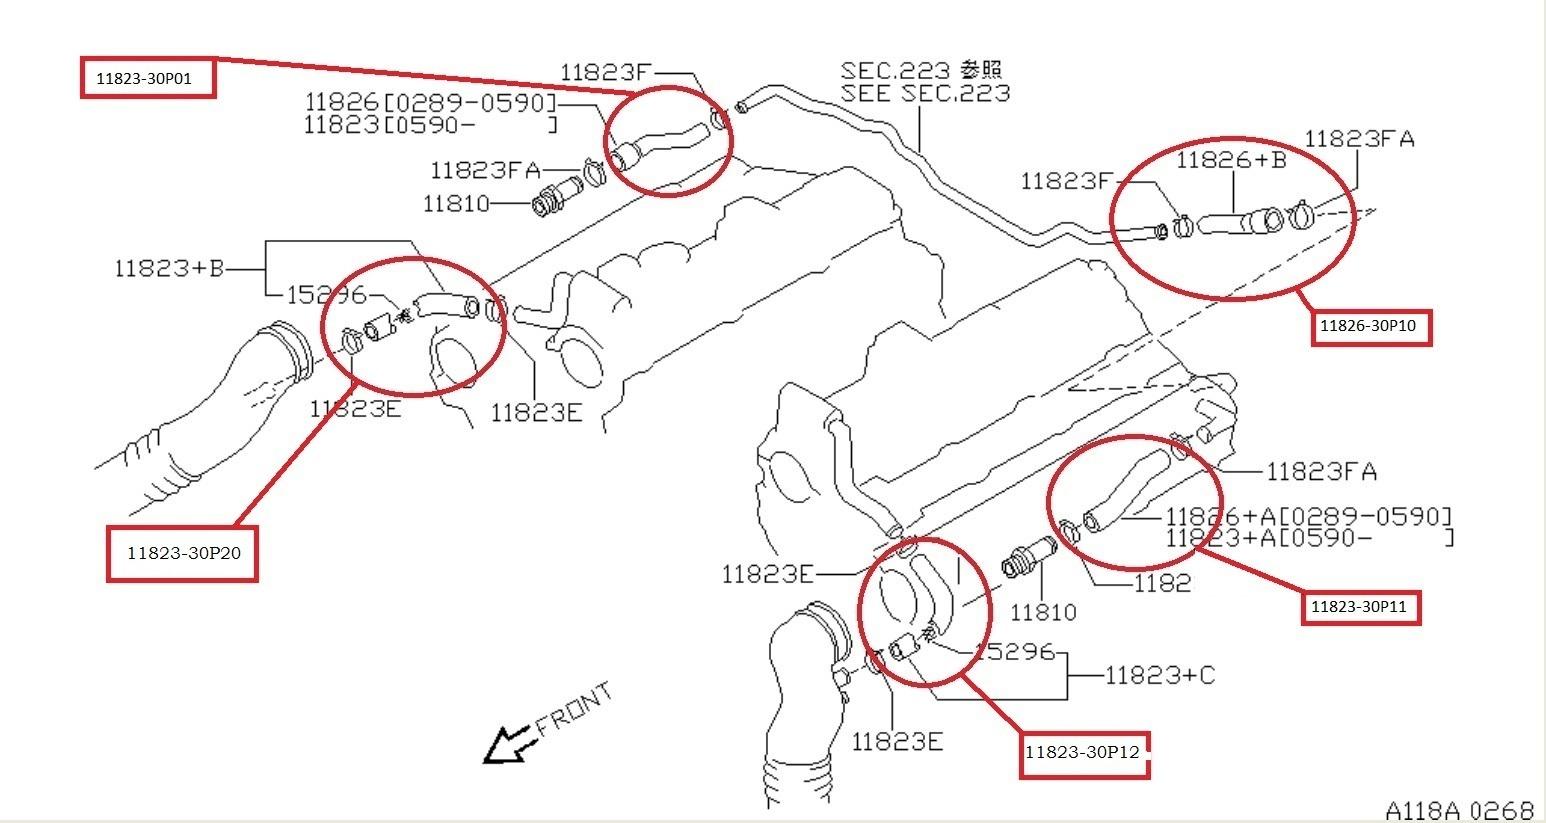 hight resolution of z32 tt vacuum diagram wiring schematic diagram 1990 300zx radio wiring diagram wiring diagram z31 300zx